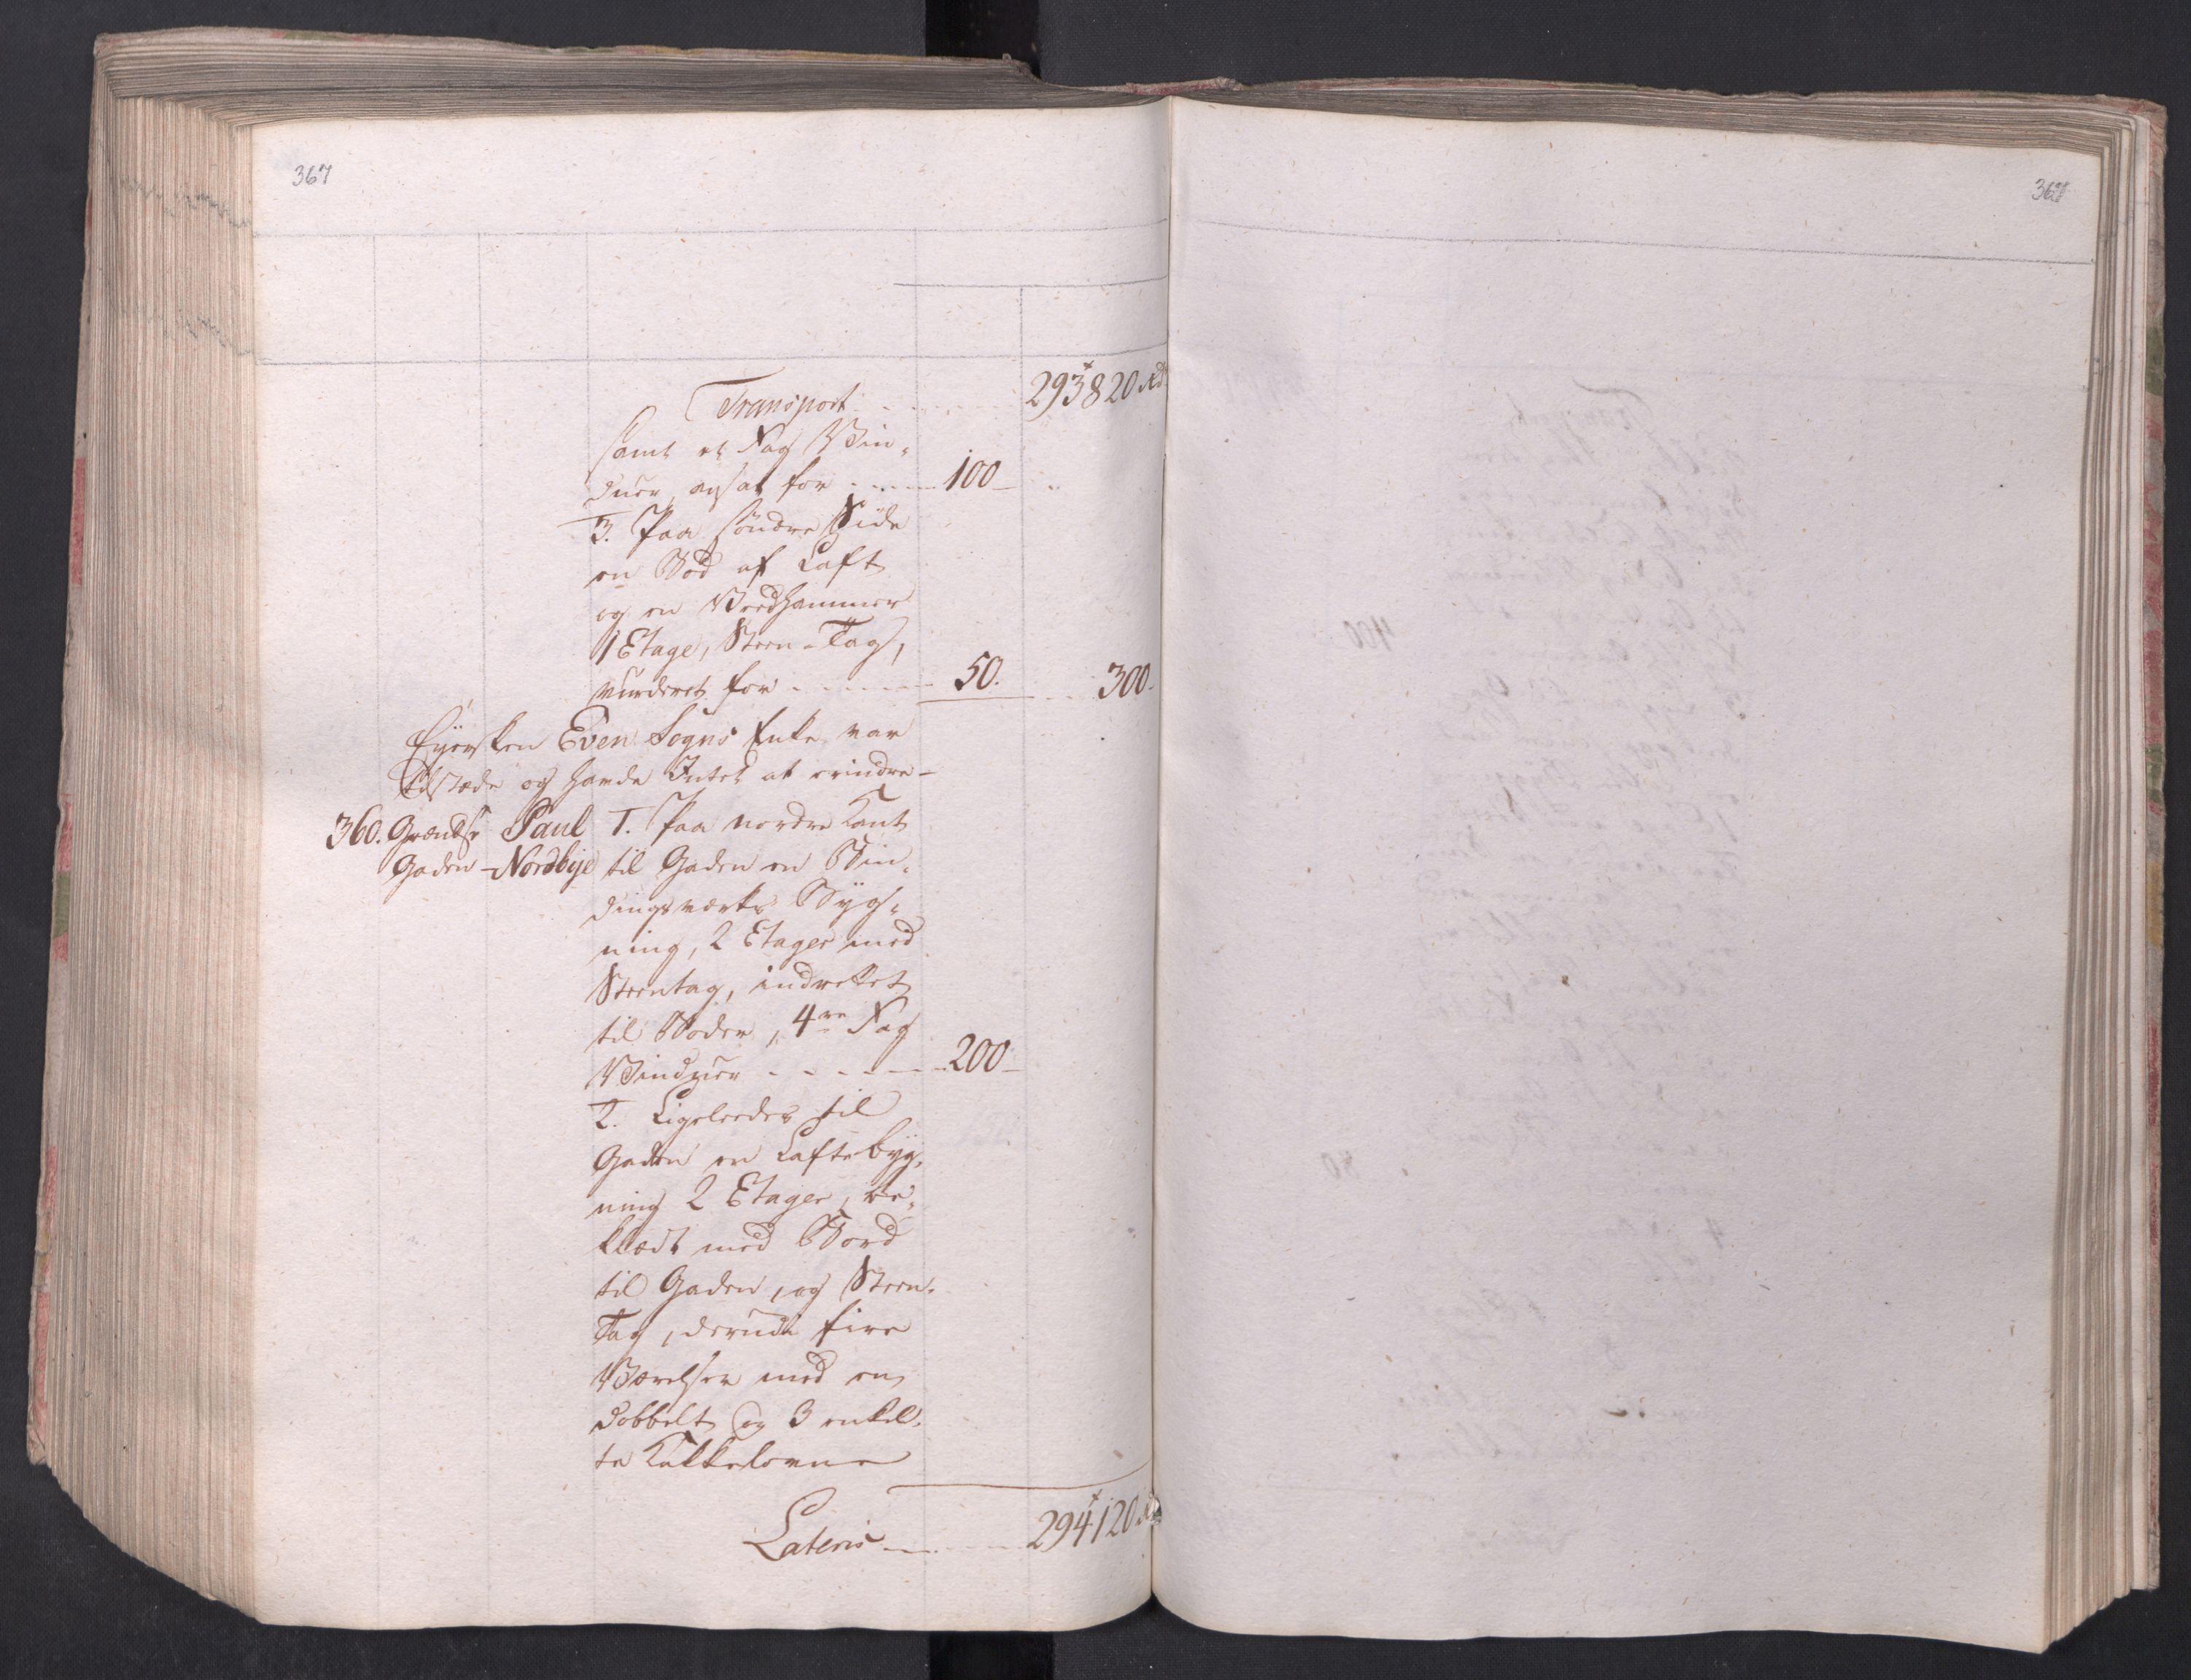 SAO, Kristiania stiftamt, I/Ia/L0015: Branntakster, 1797, s. 367